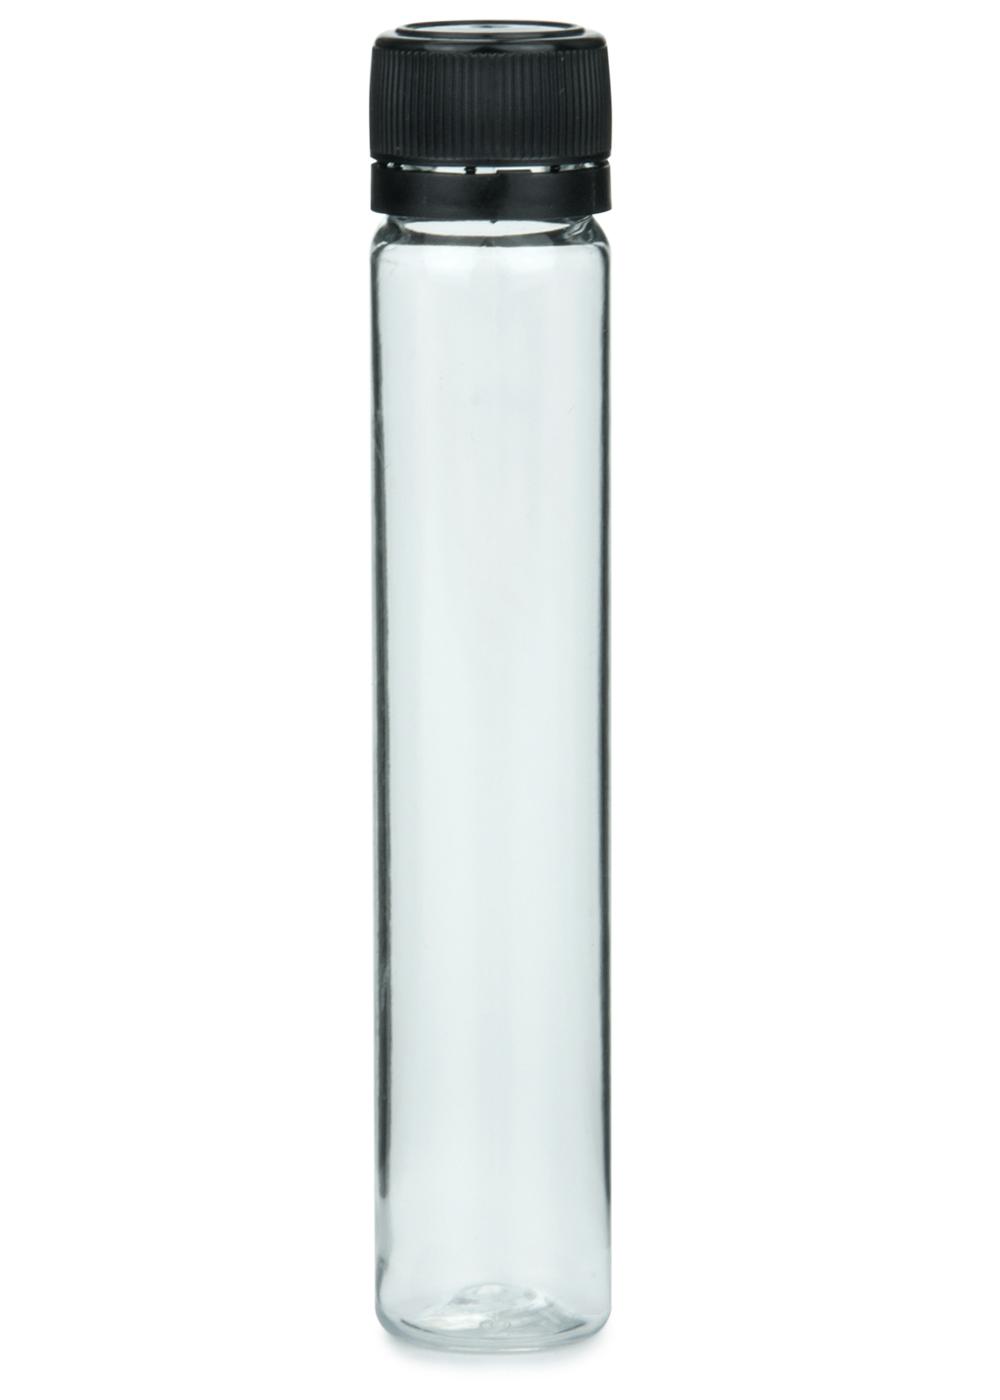 pet mini flasche norma 25 ml klar inkl schraubverschluss. Black Bedroom Furniture Sets. Home Design Ideas